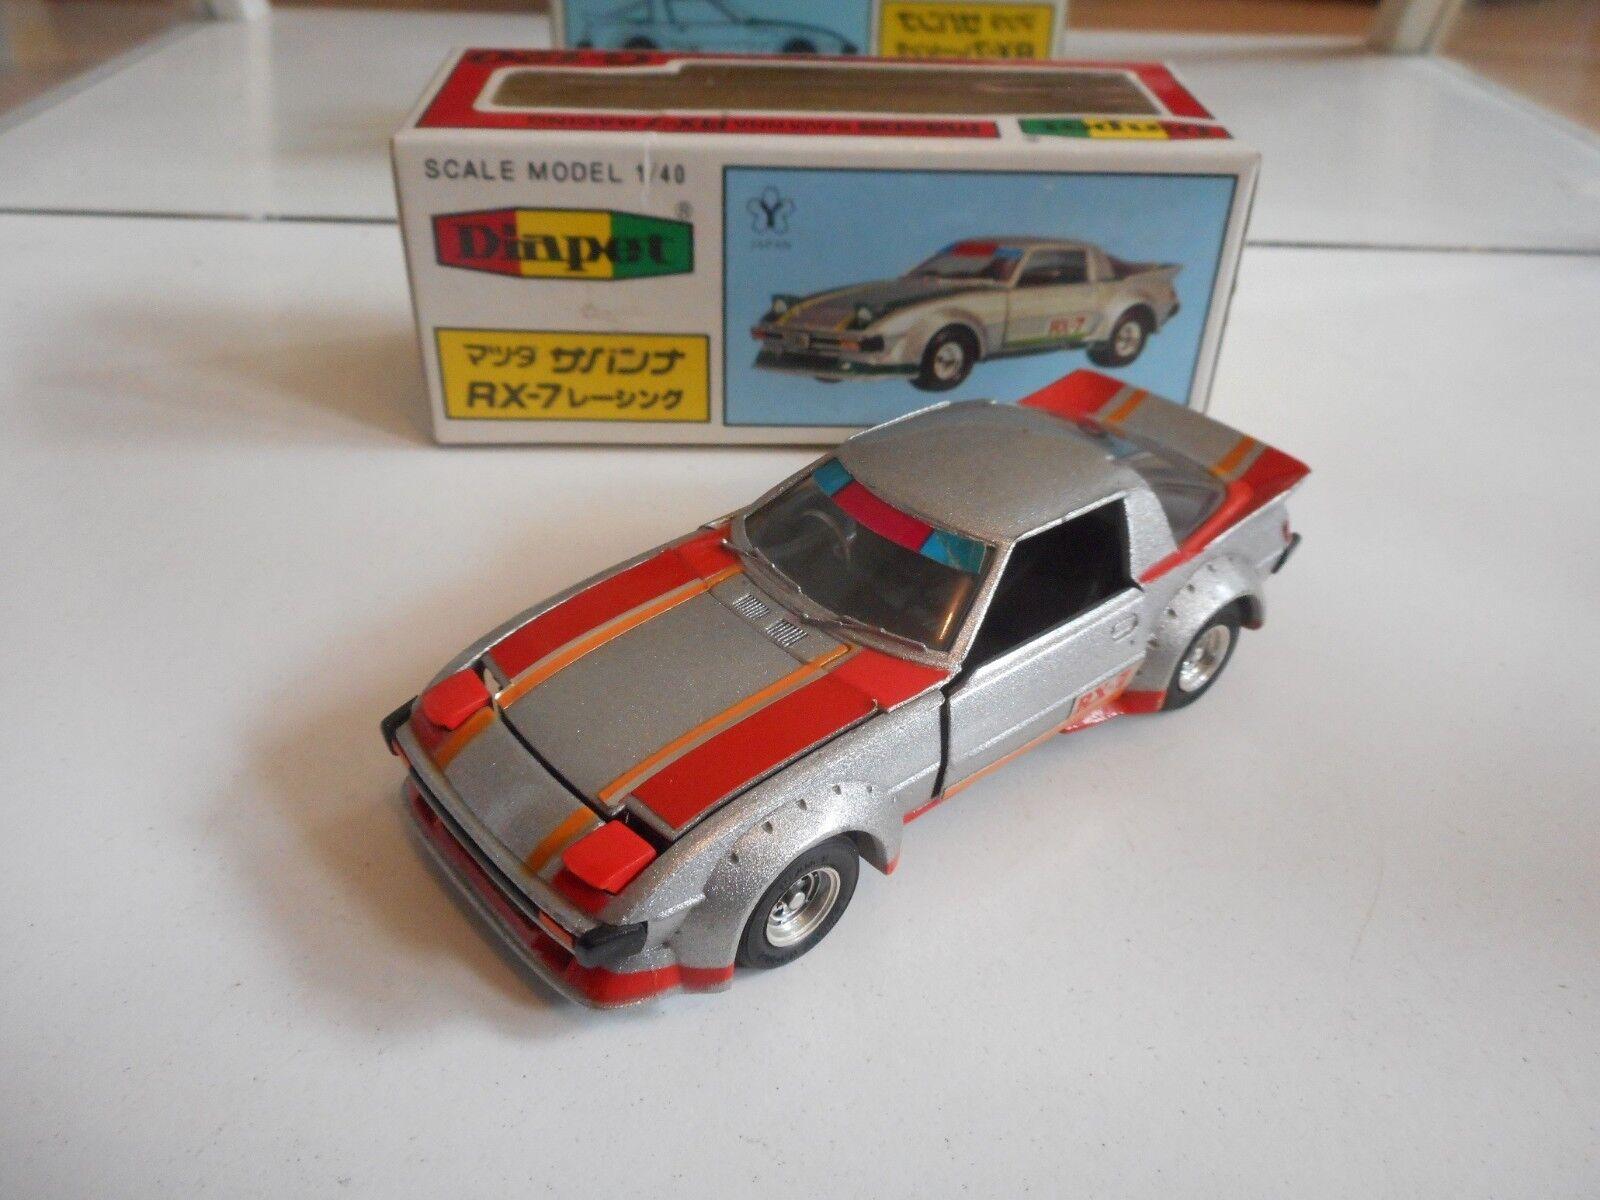 Yonezawa Yonezawa Yonezawa Toys Diapet Mazda Savanna RX-7 in Grey on 1 40 in Box 7f6c5c